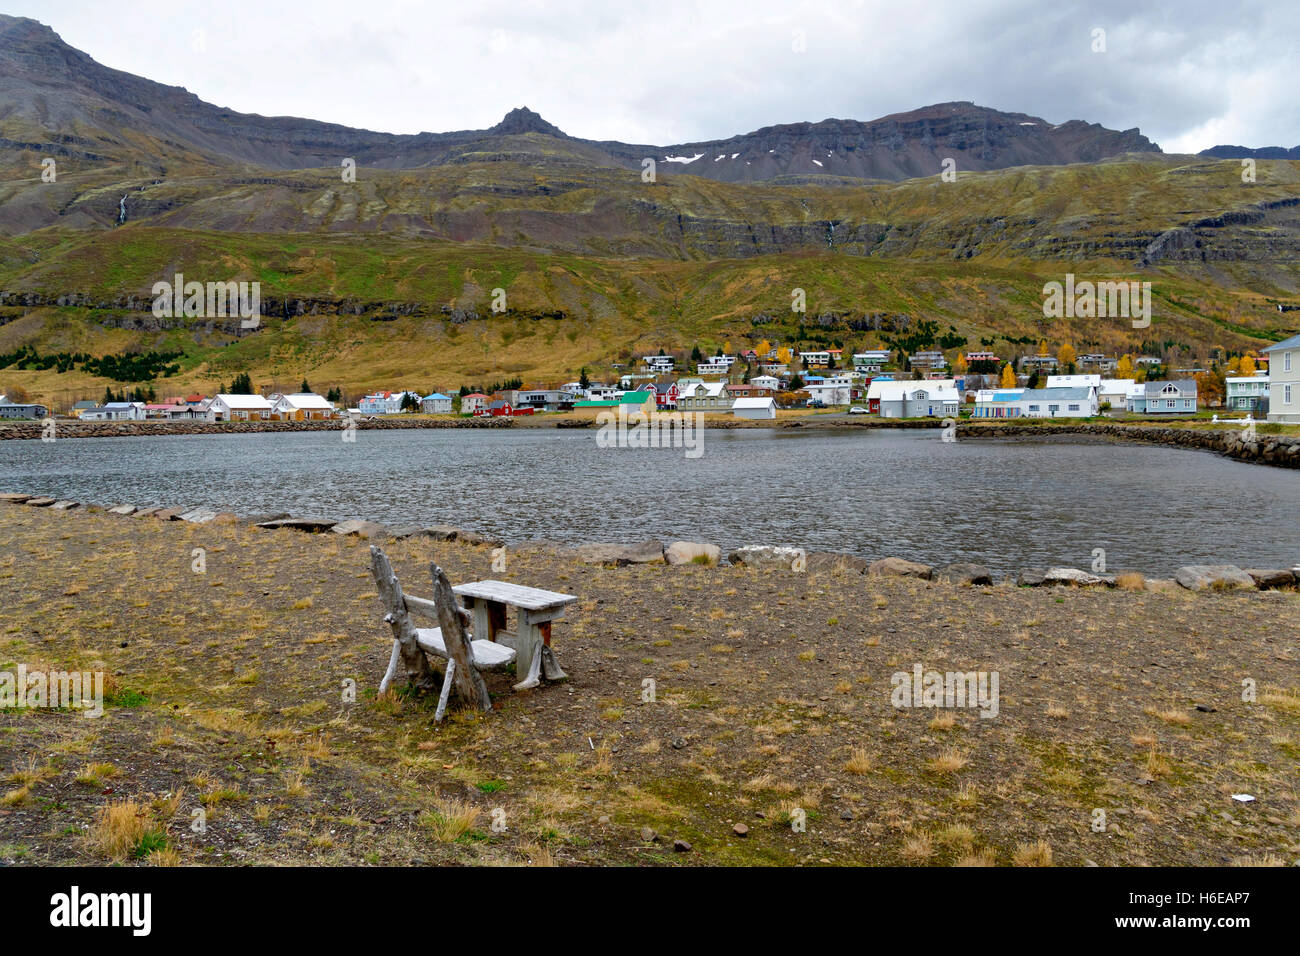 Old wooden table setting, Seydisfjordur, East Iceland, North Atlantic, Europe - Stock Image